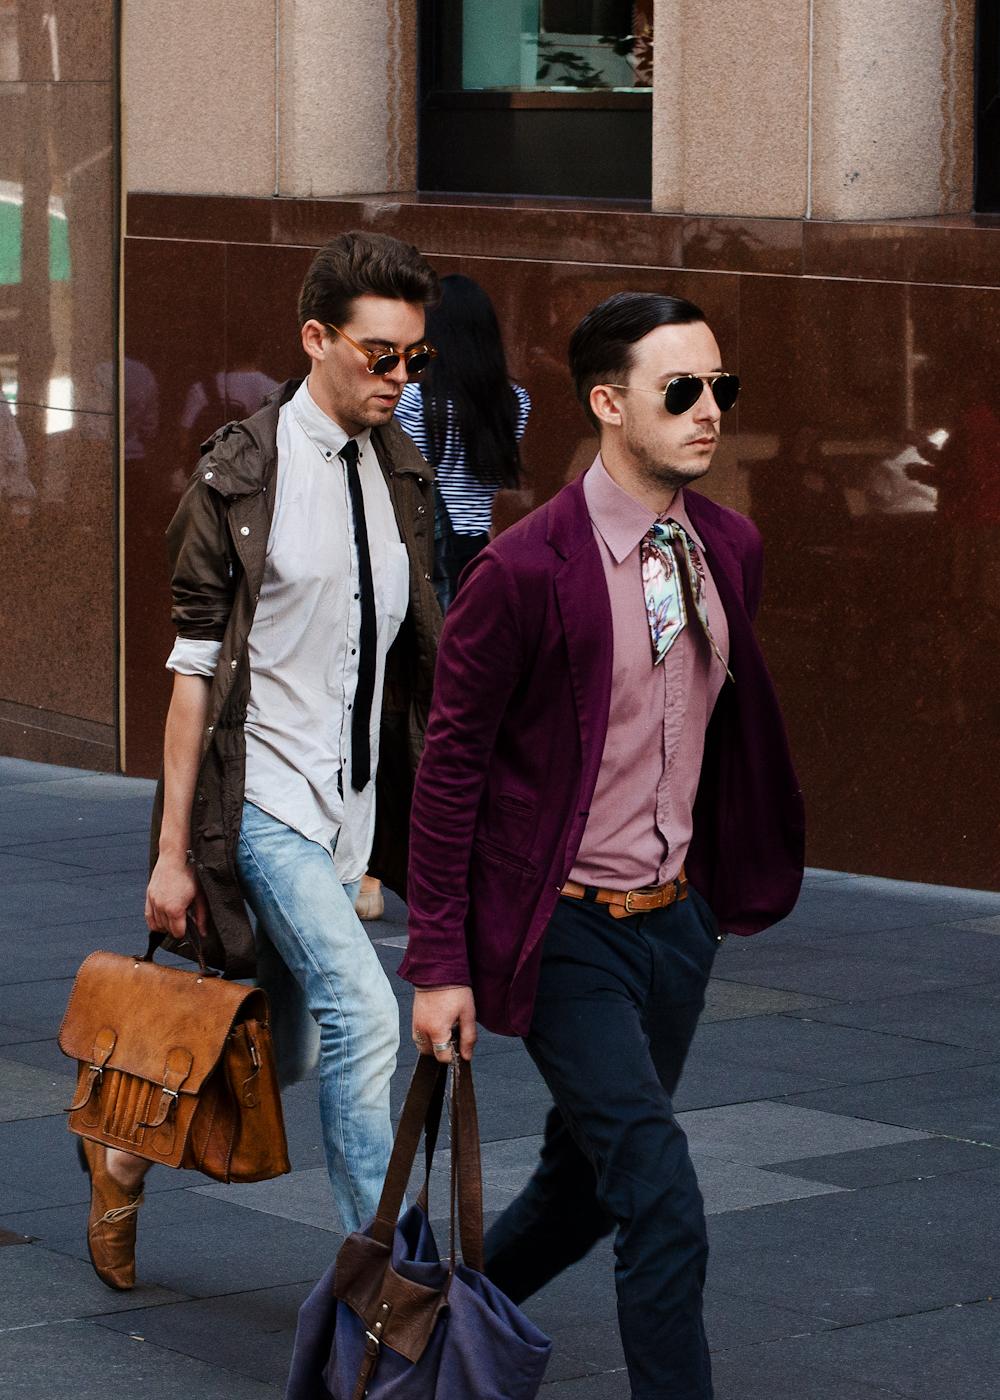 #menswear   Similar look:  ASOS Slim Fit Blazer in Velvet  .